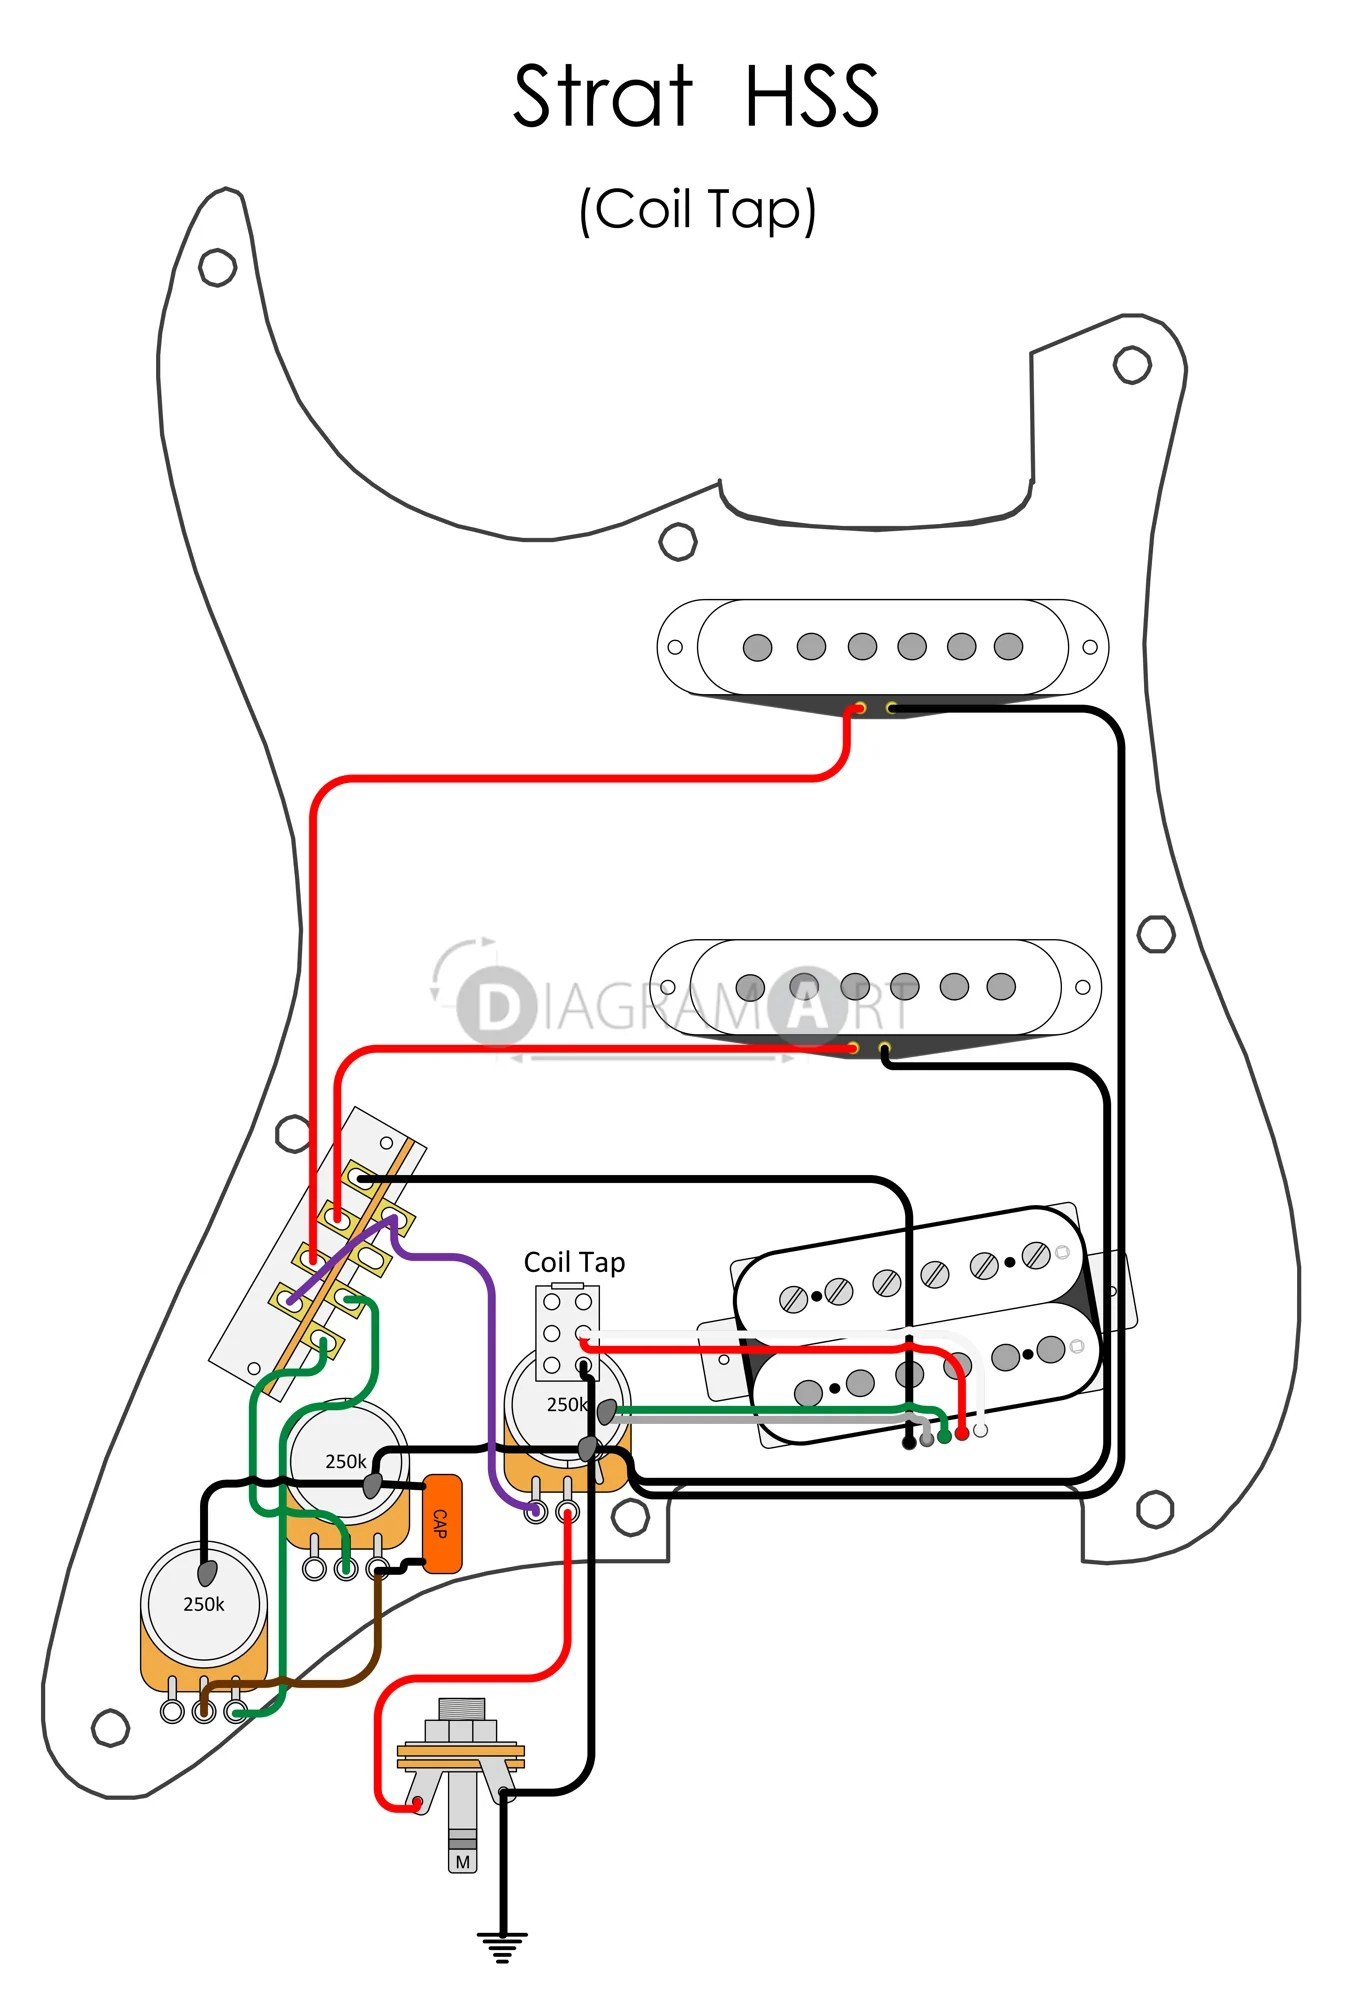 washburn wiring diagrams wiring diagram z4washburn wiring schematics wiring diagram z4 cavalier wiring diagrams washburn wiring [ 1348 x 2000 Pixel ]